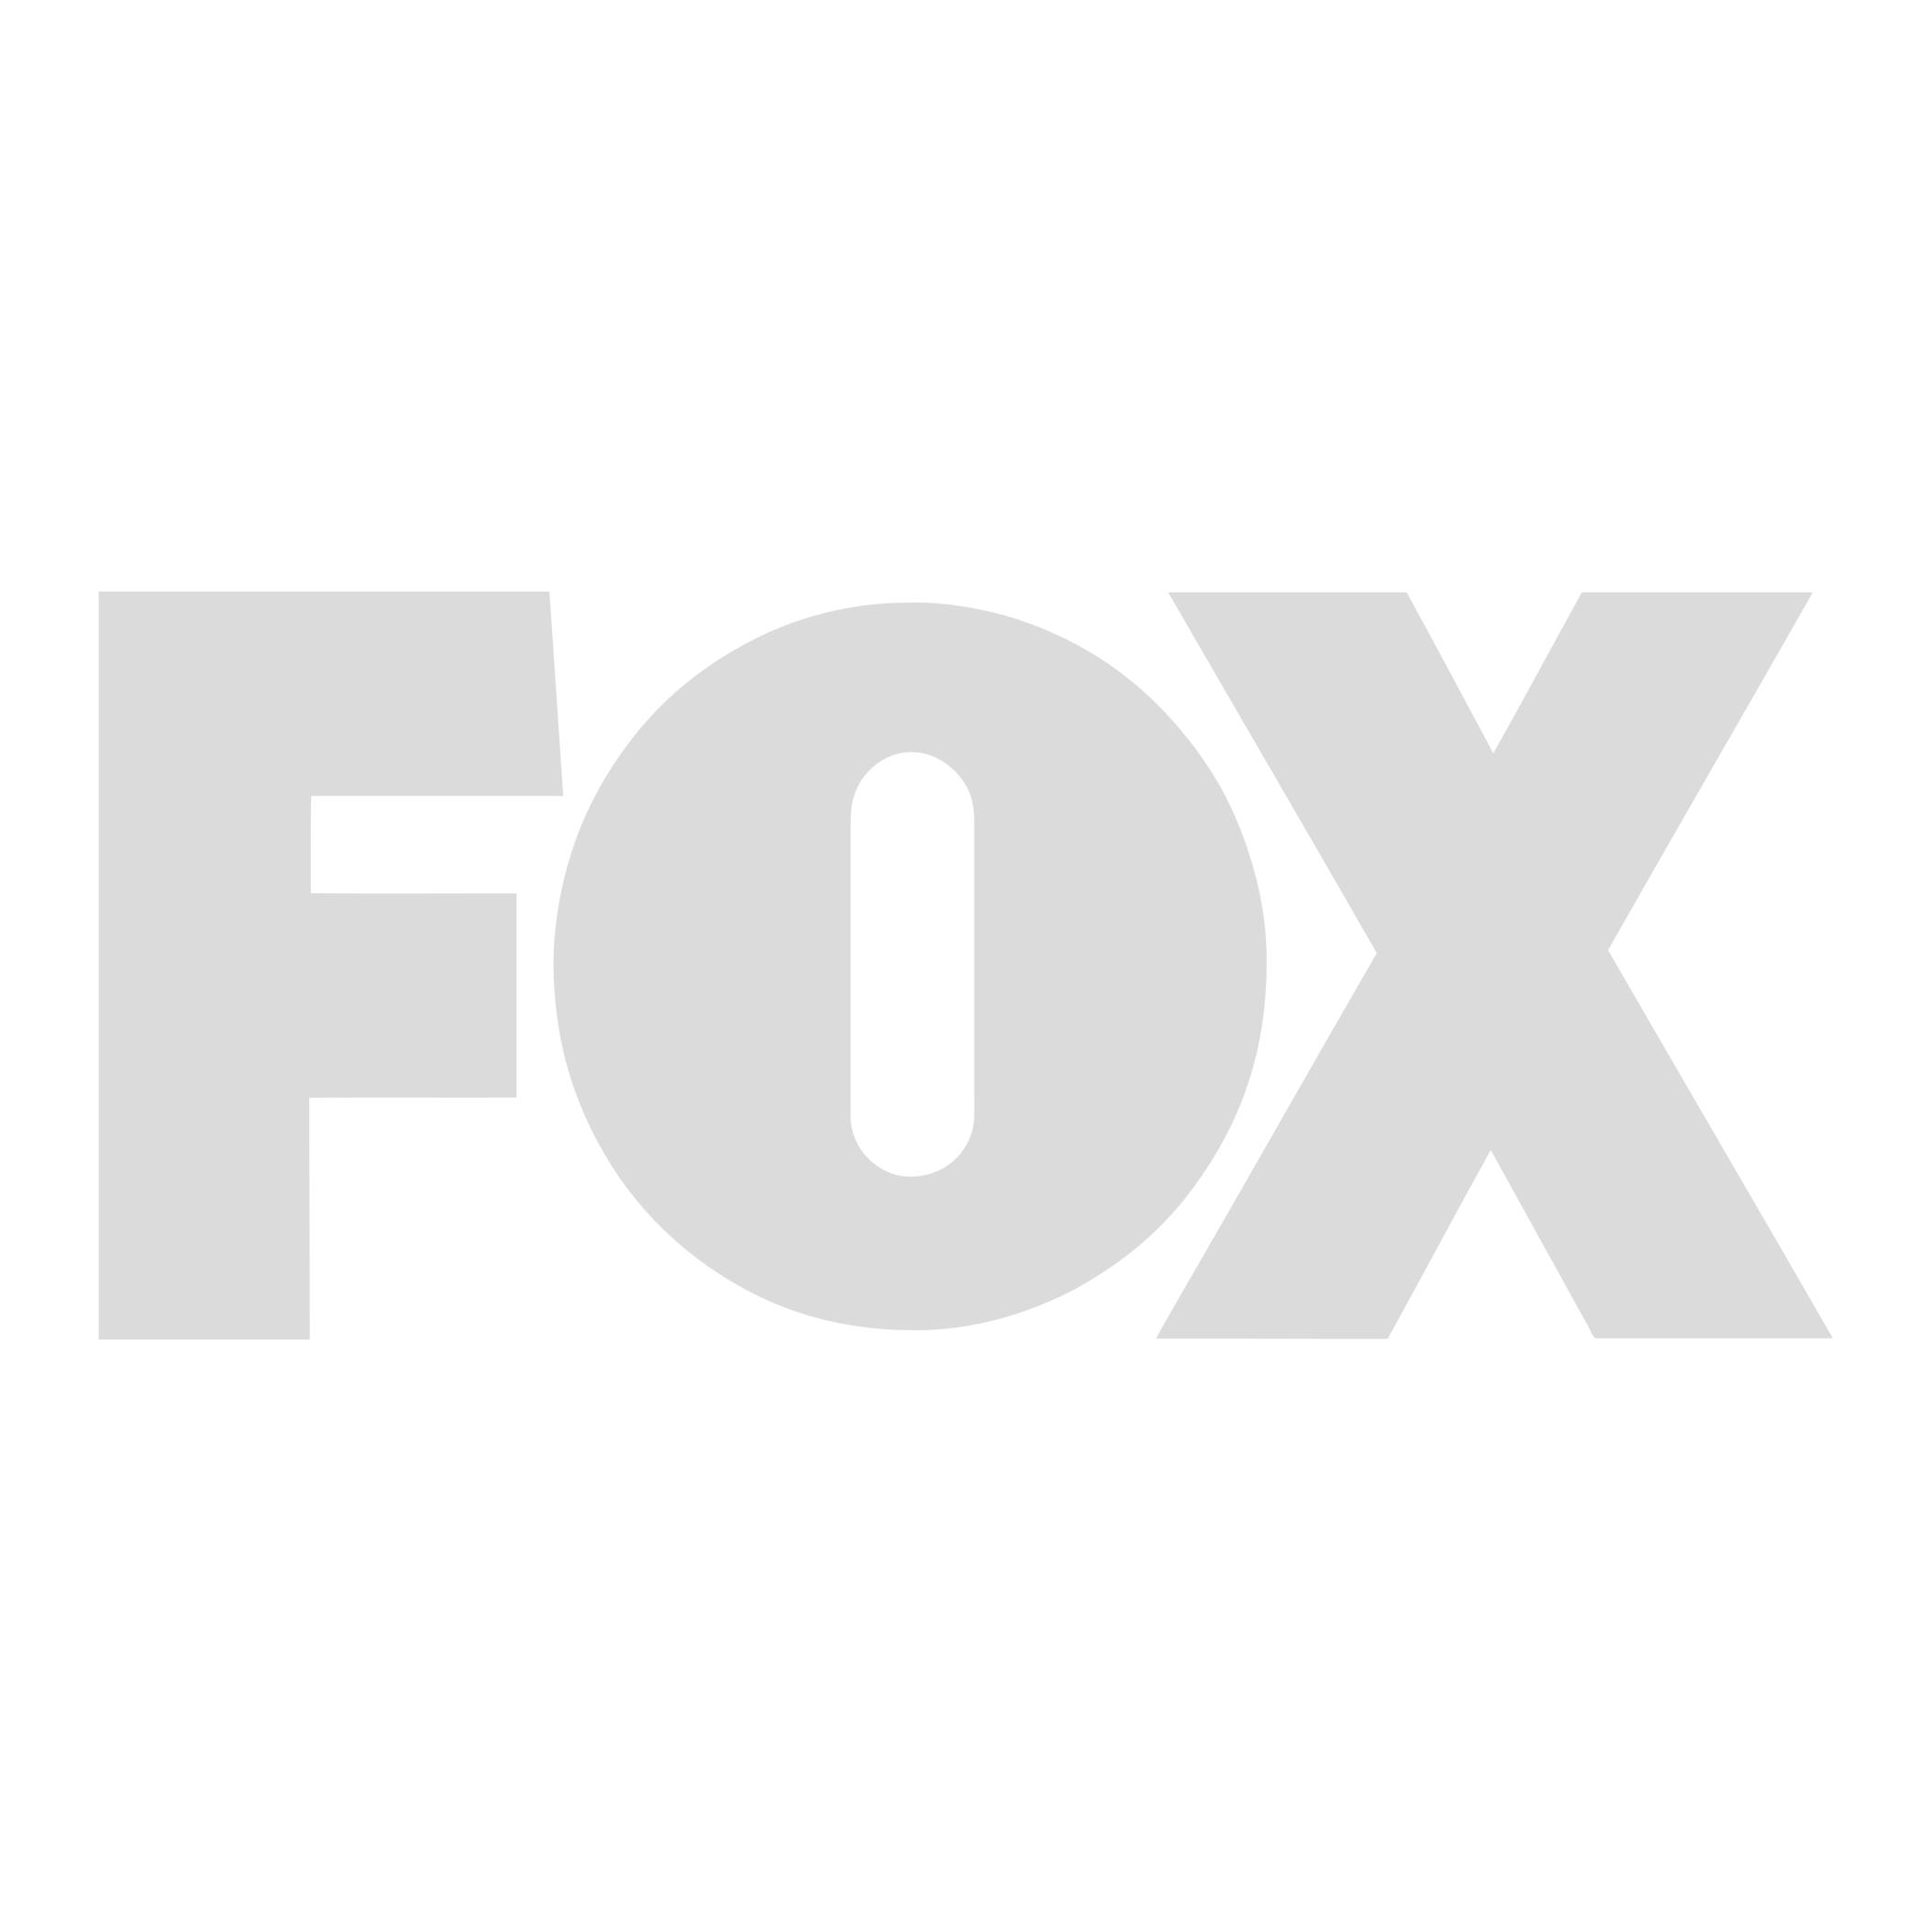 FOX_GRAY.png